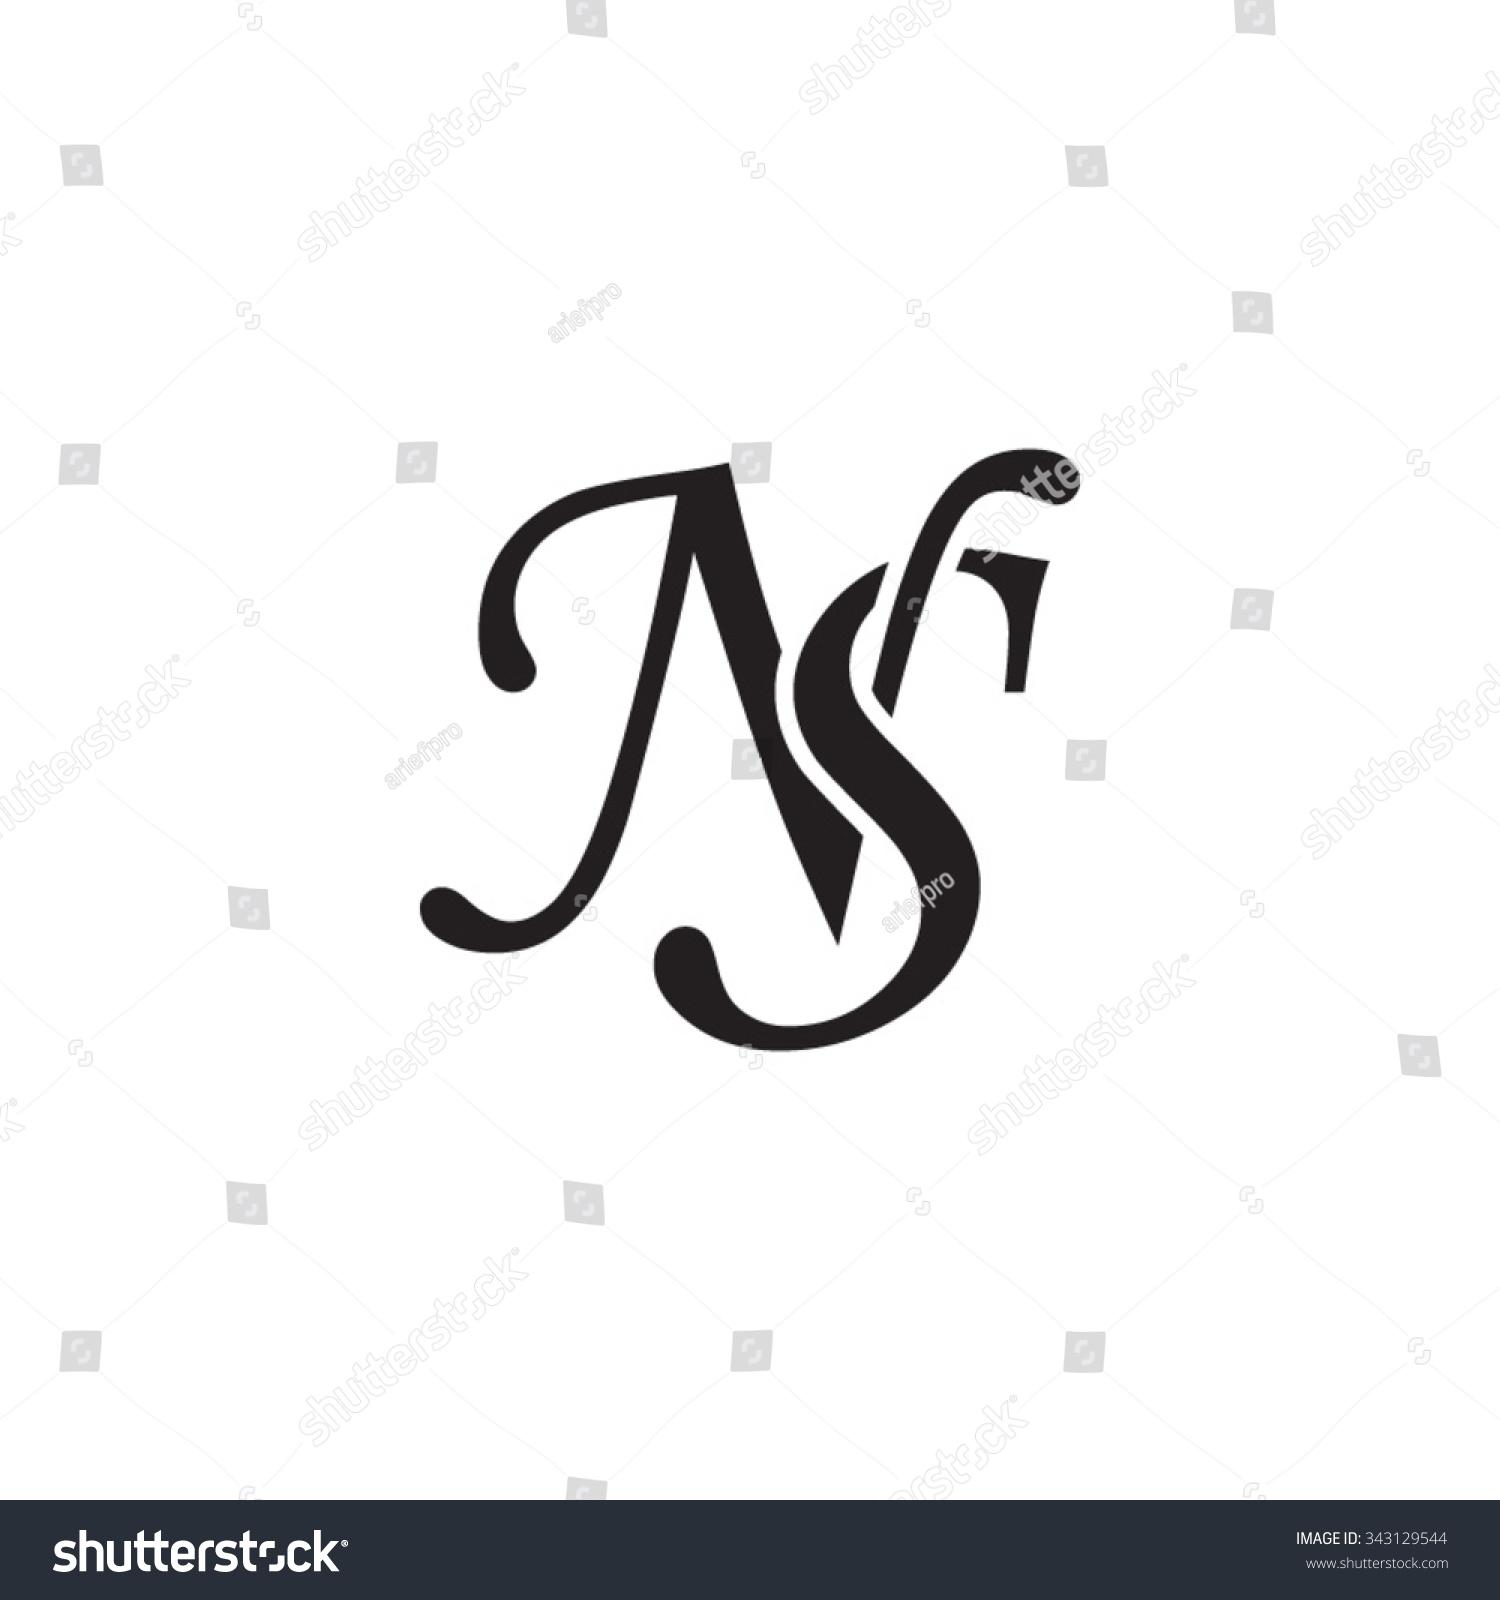 Ns Initial Monogram Logo Stock Vector 343129544 Shutterstock